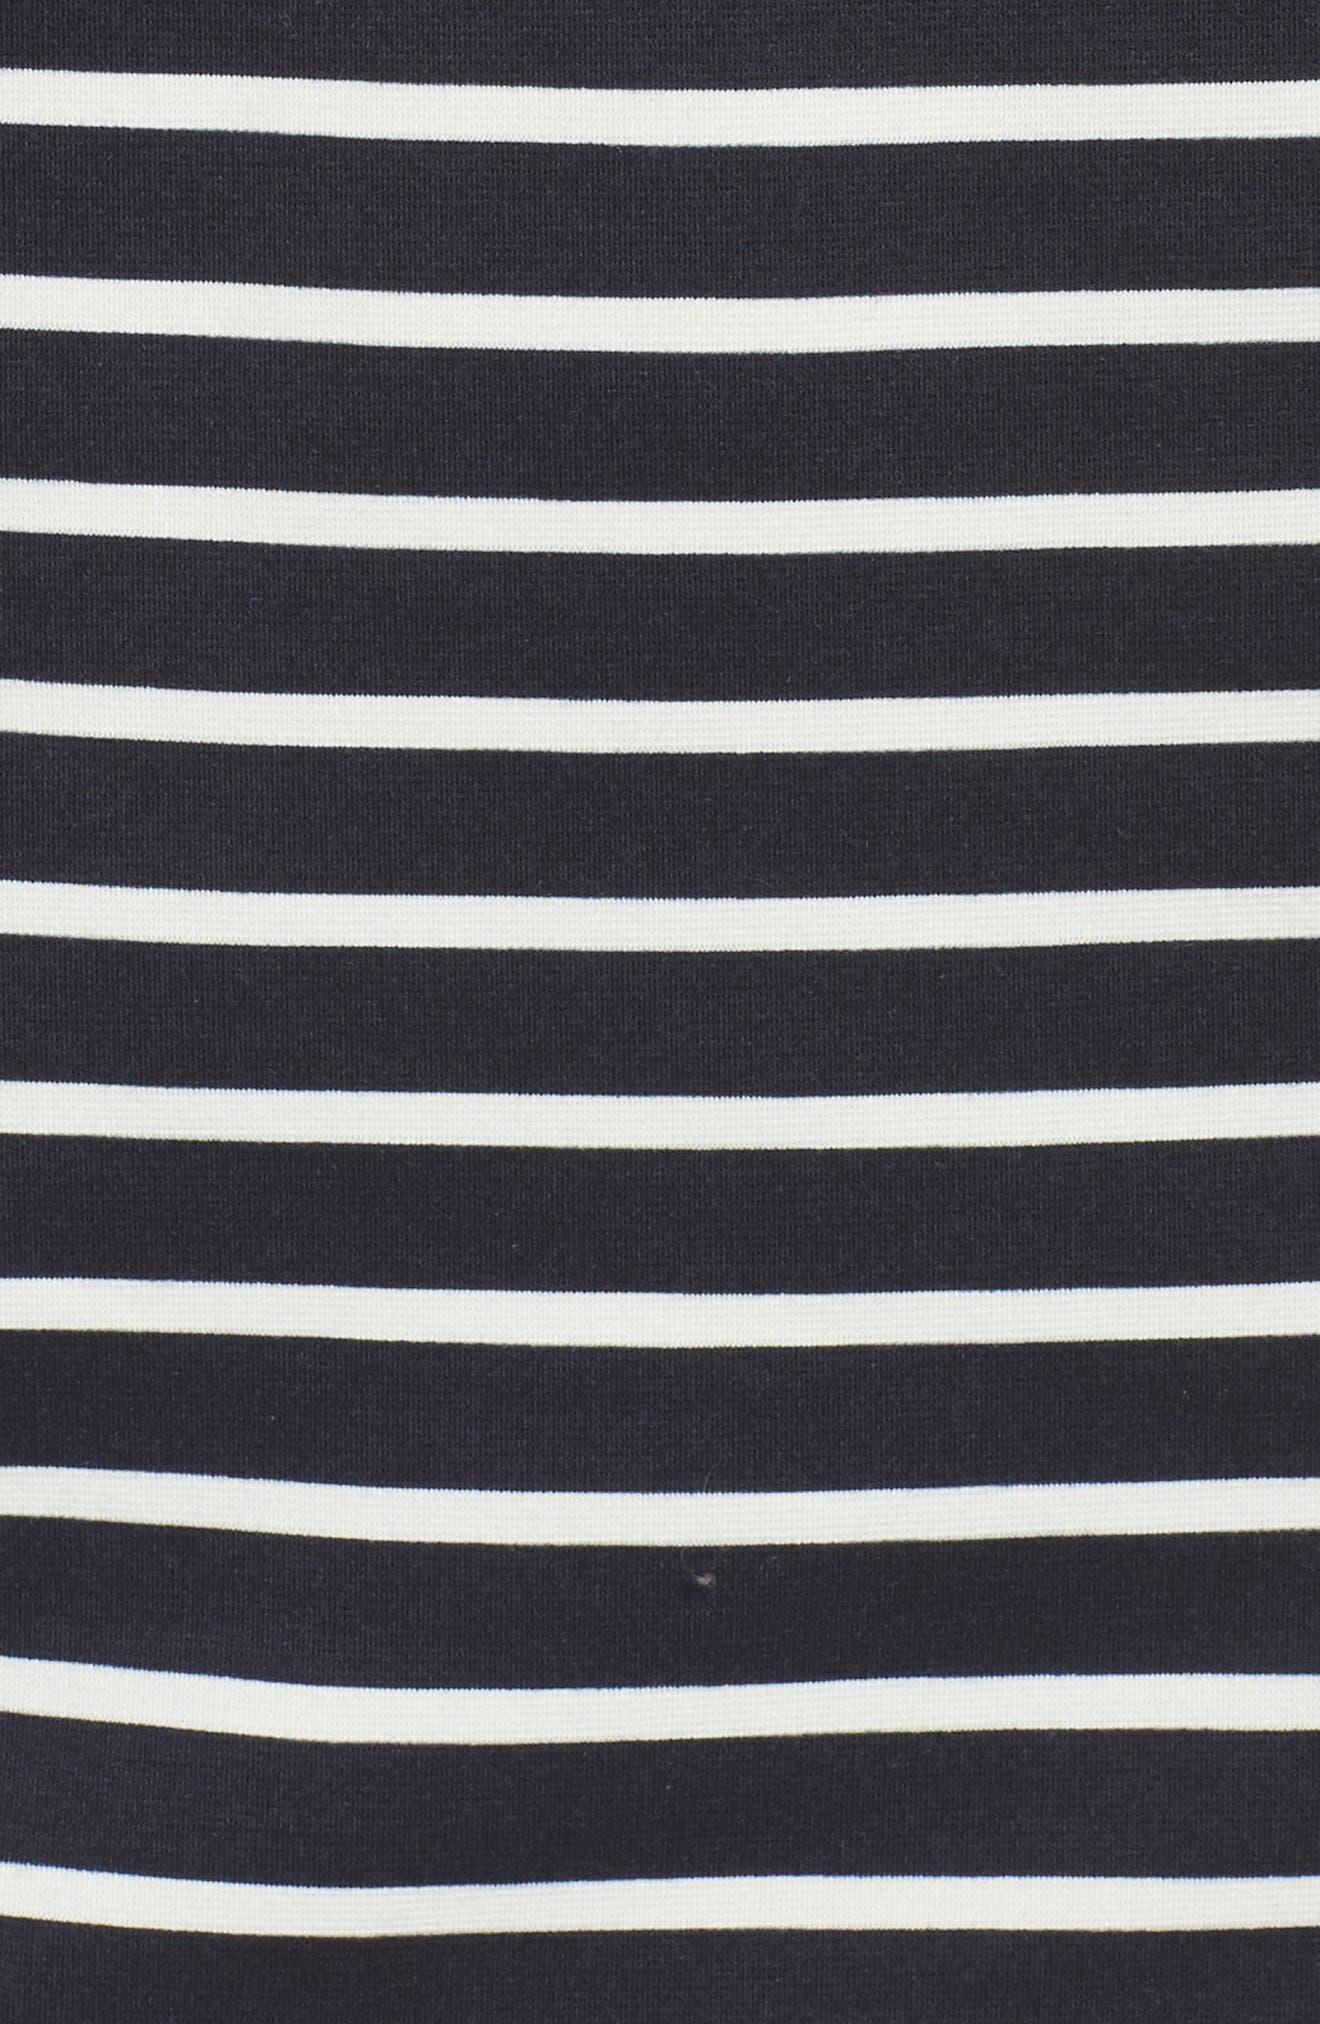 Puff Sleeve Shift Dress,                             Alternate thumbnail 5, color,                             407